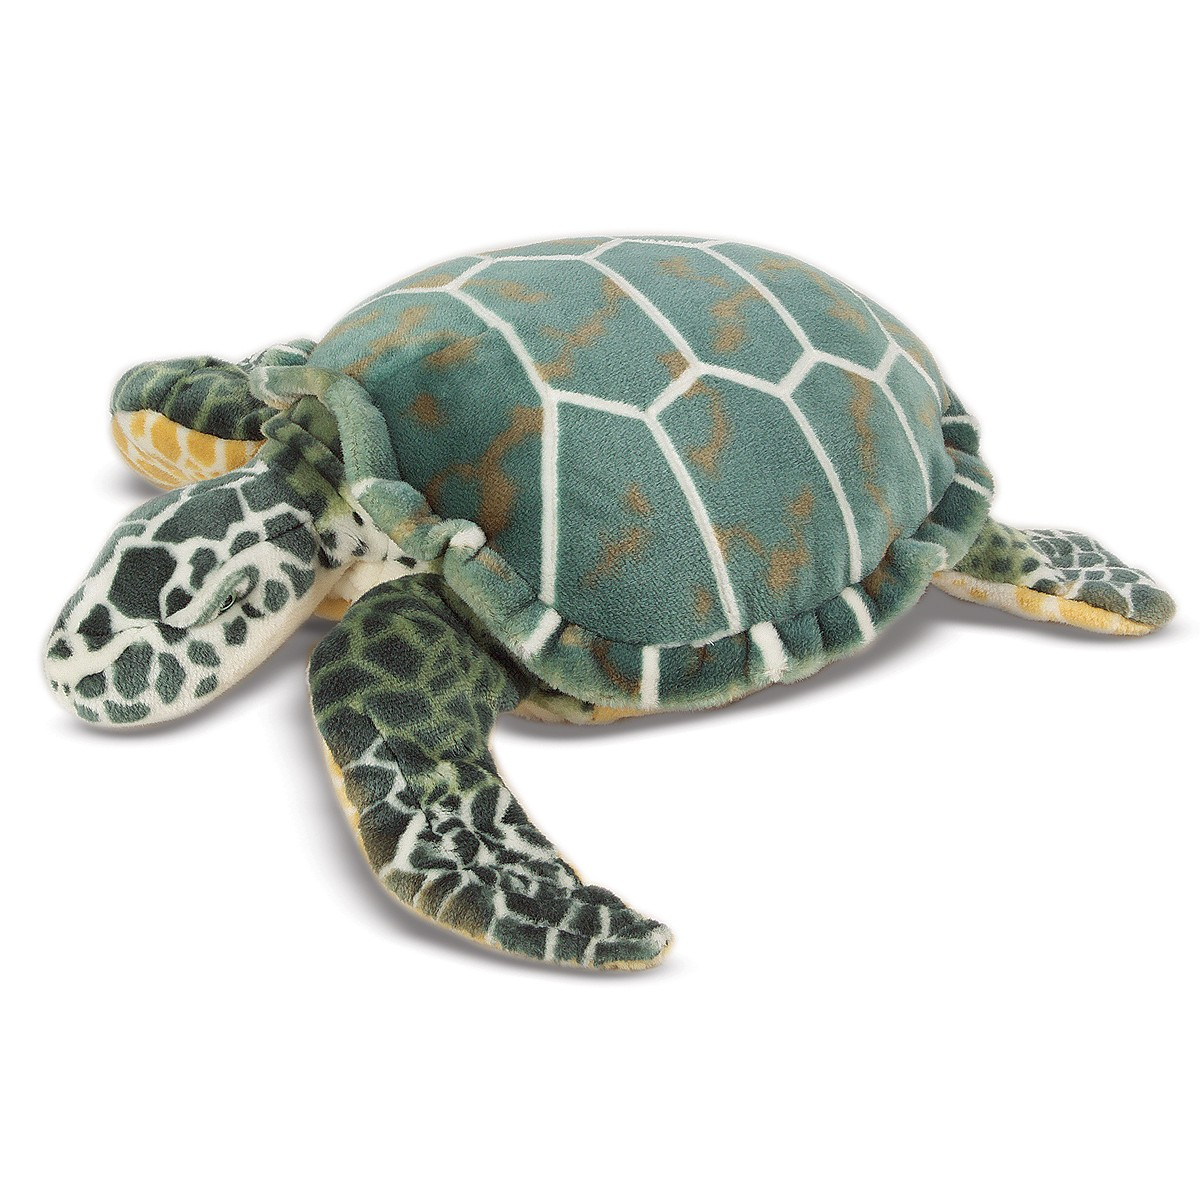 Мягкая игрушка - ЧерепахаЖивотные<br>Мягкая игрушка - Черепаха<br>